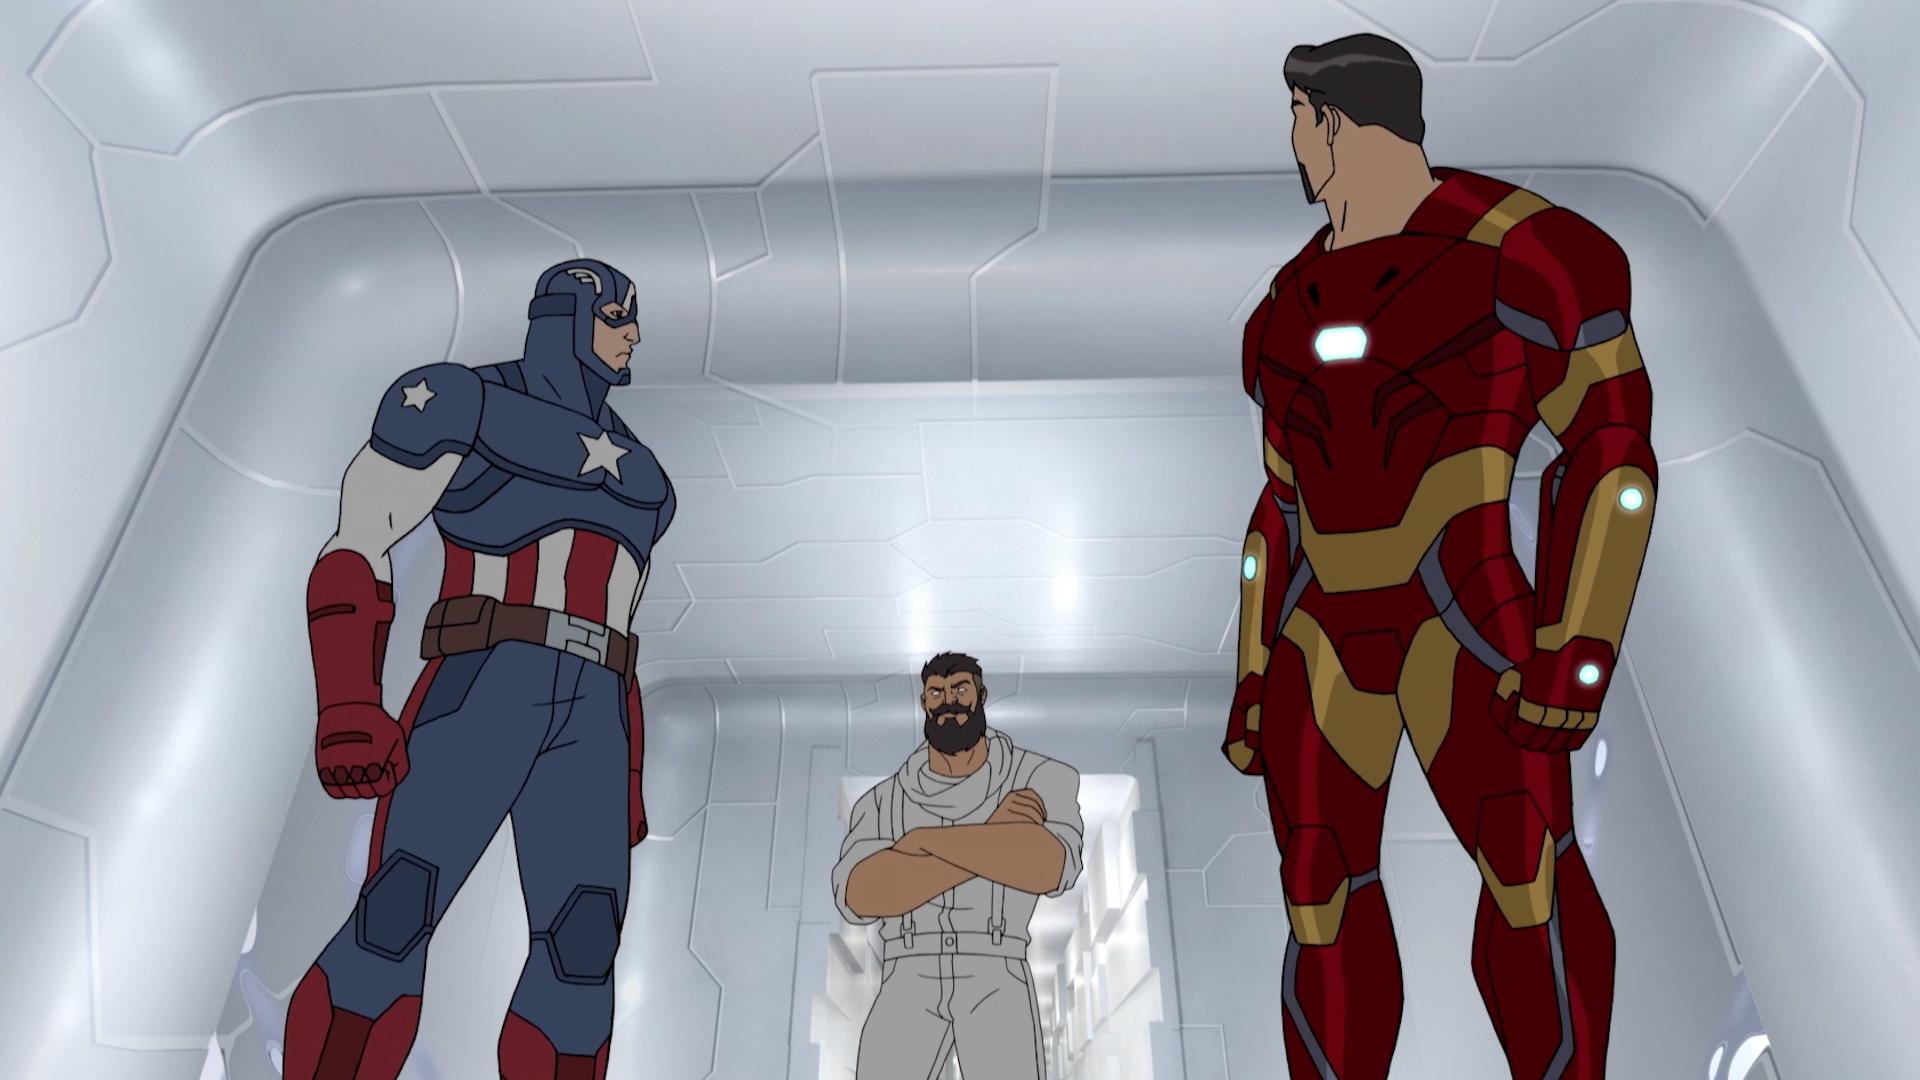 marvel avengers assemble season 4 download